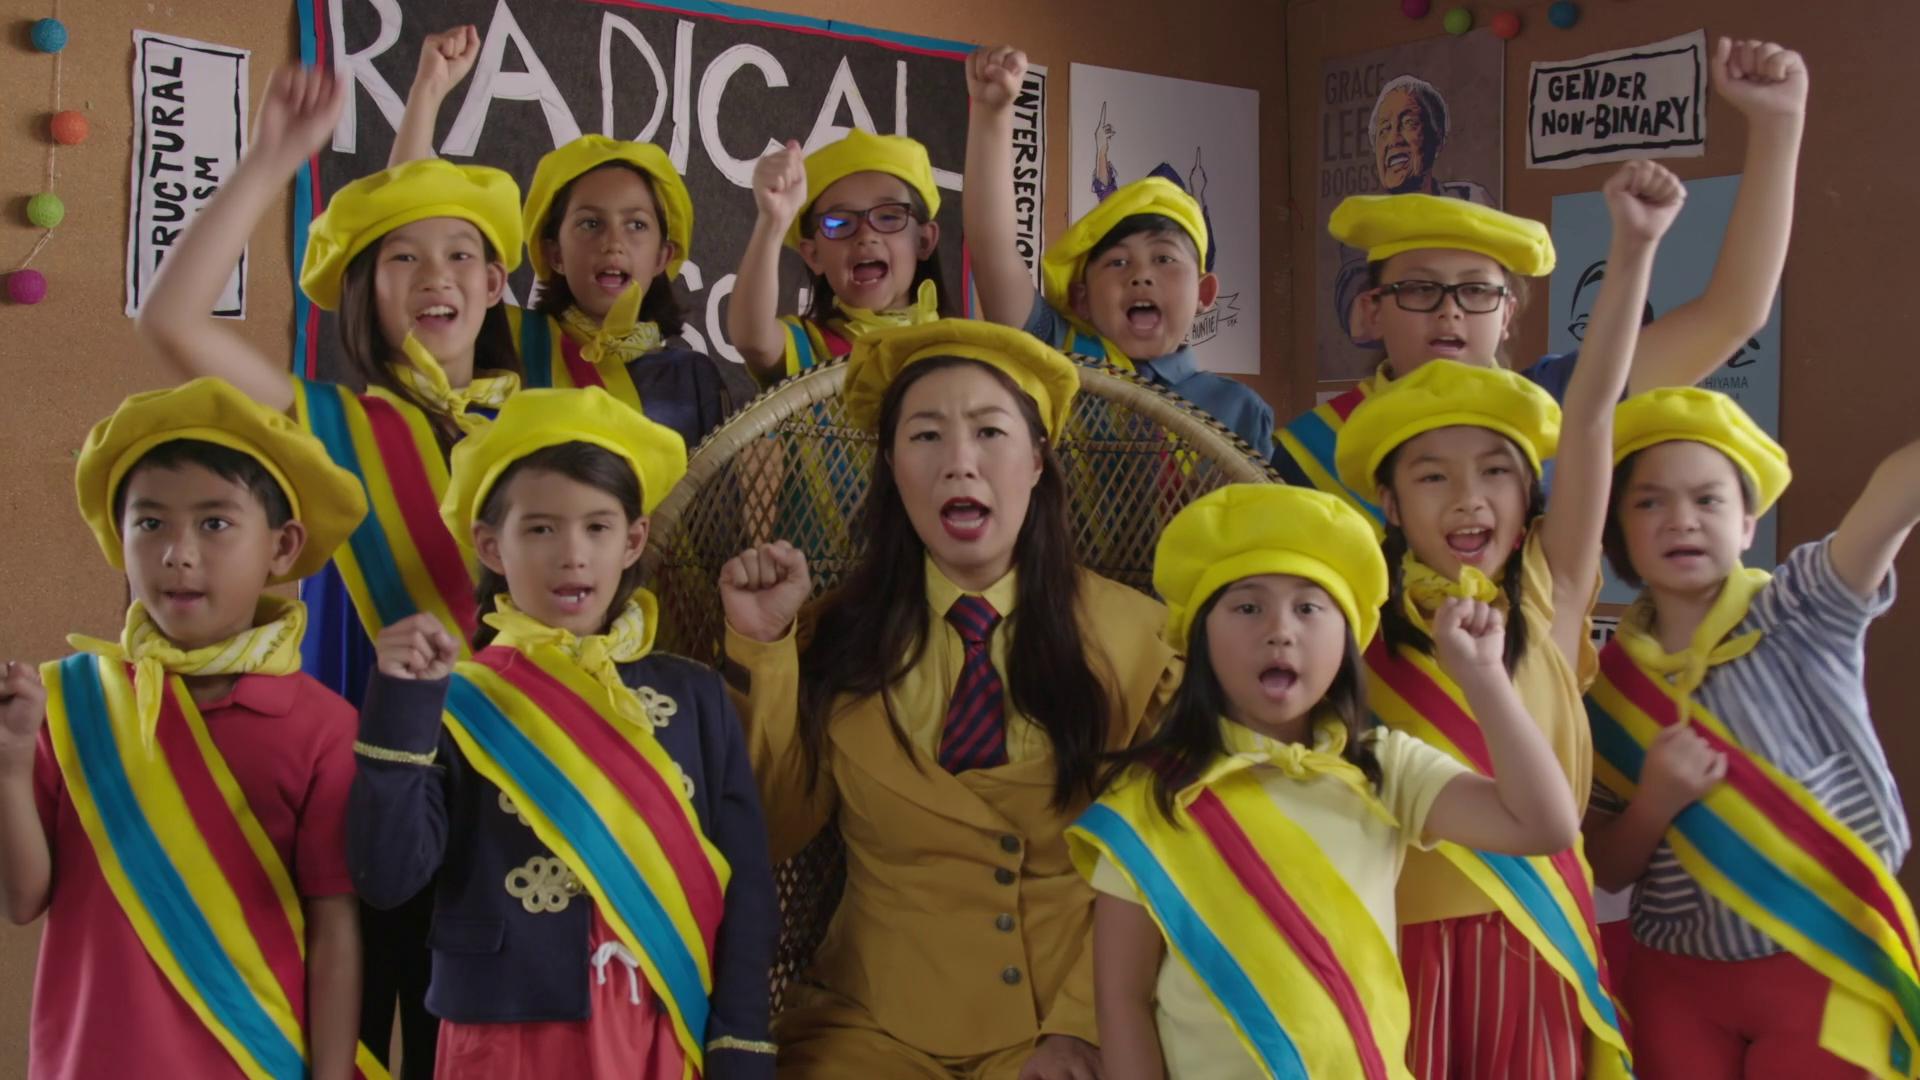 Kristina Wong's Radical Cram School